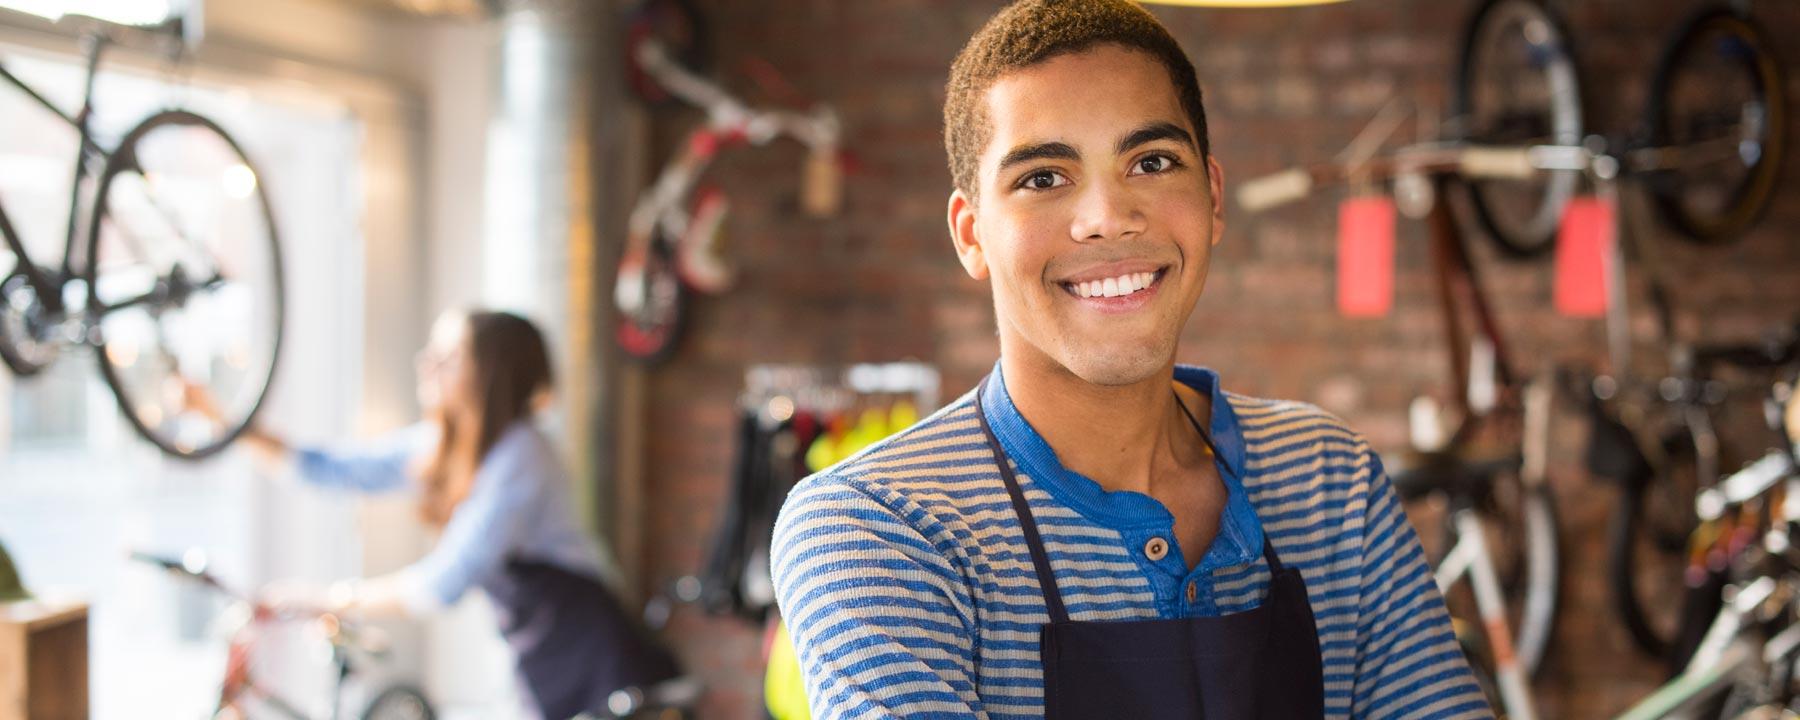 ITEC apprenticeships customer service